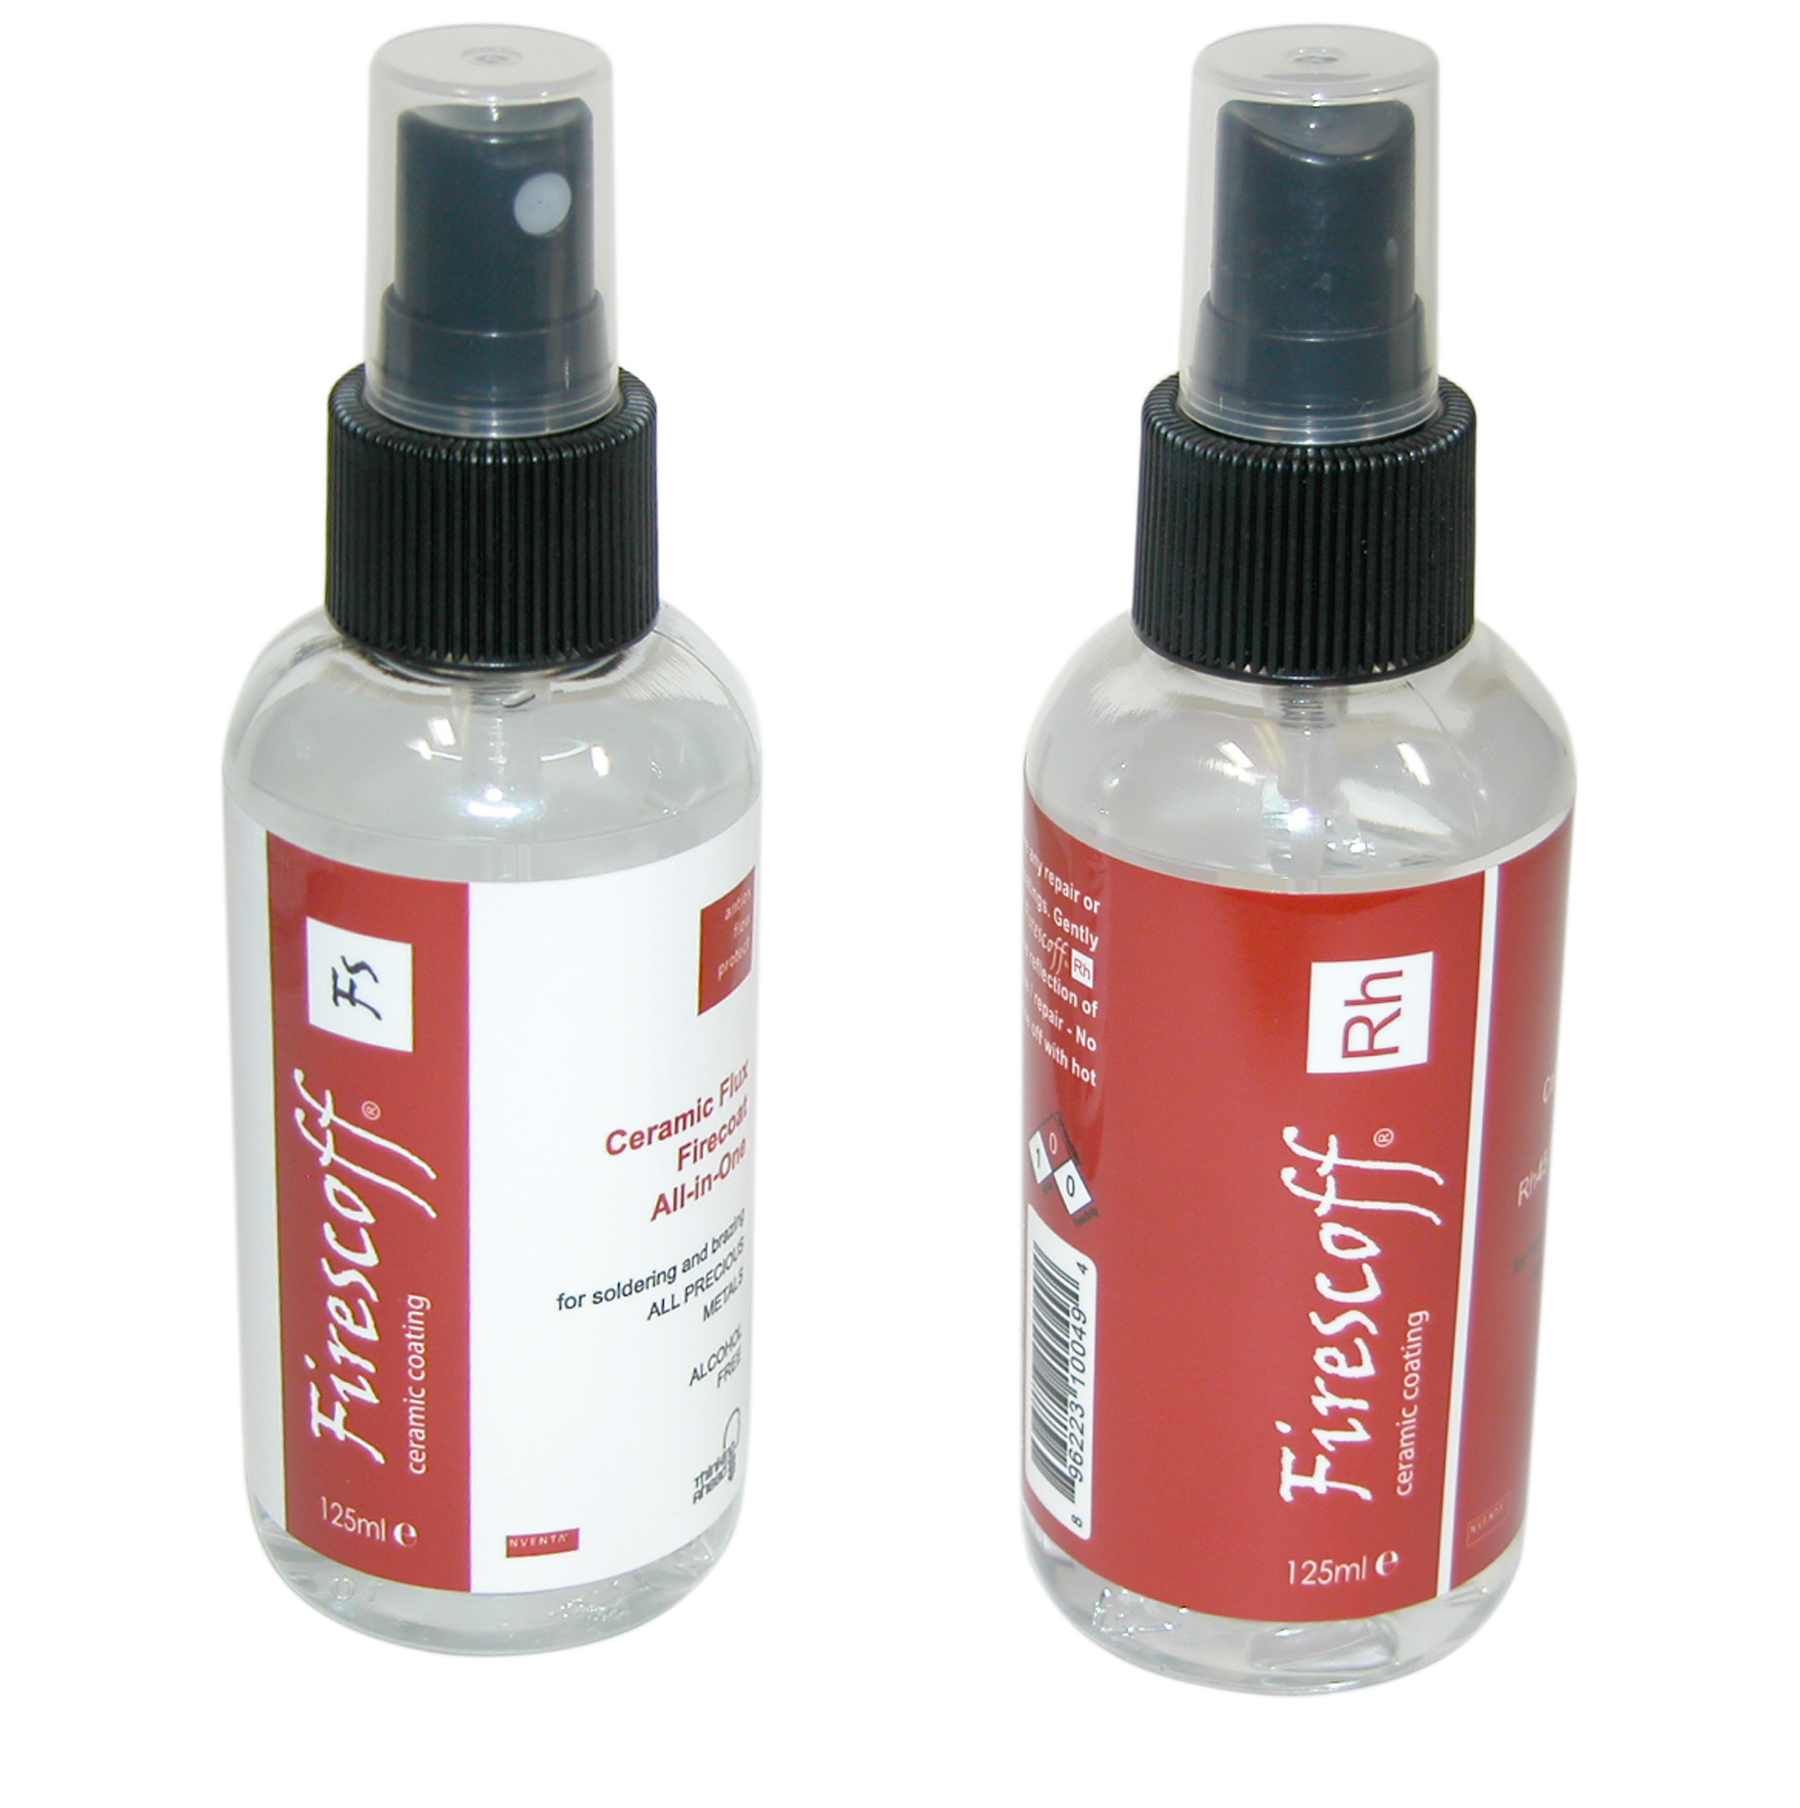 SO54.485 Firescoff Spray Ceramic Flux 125ml bottle